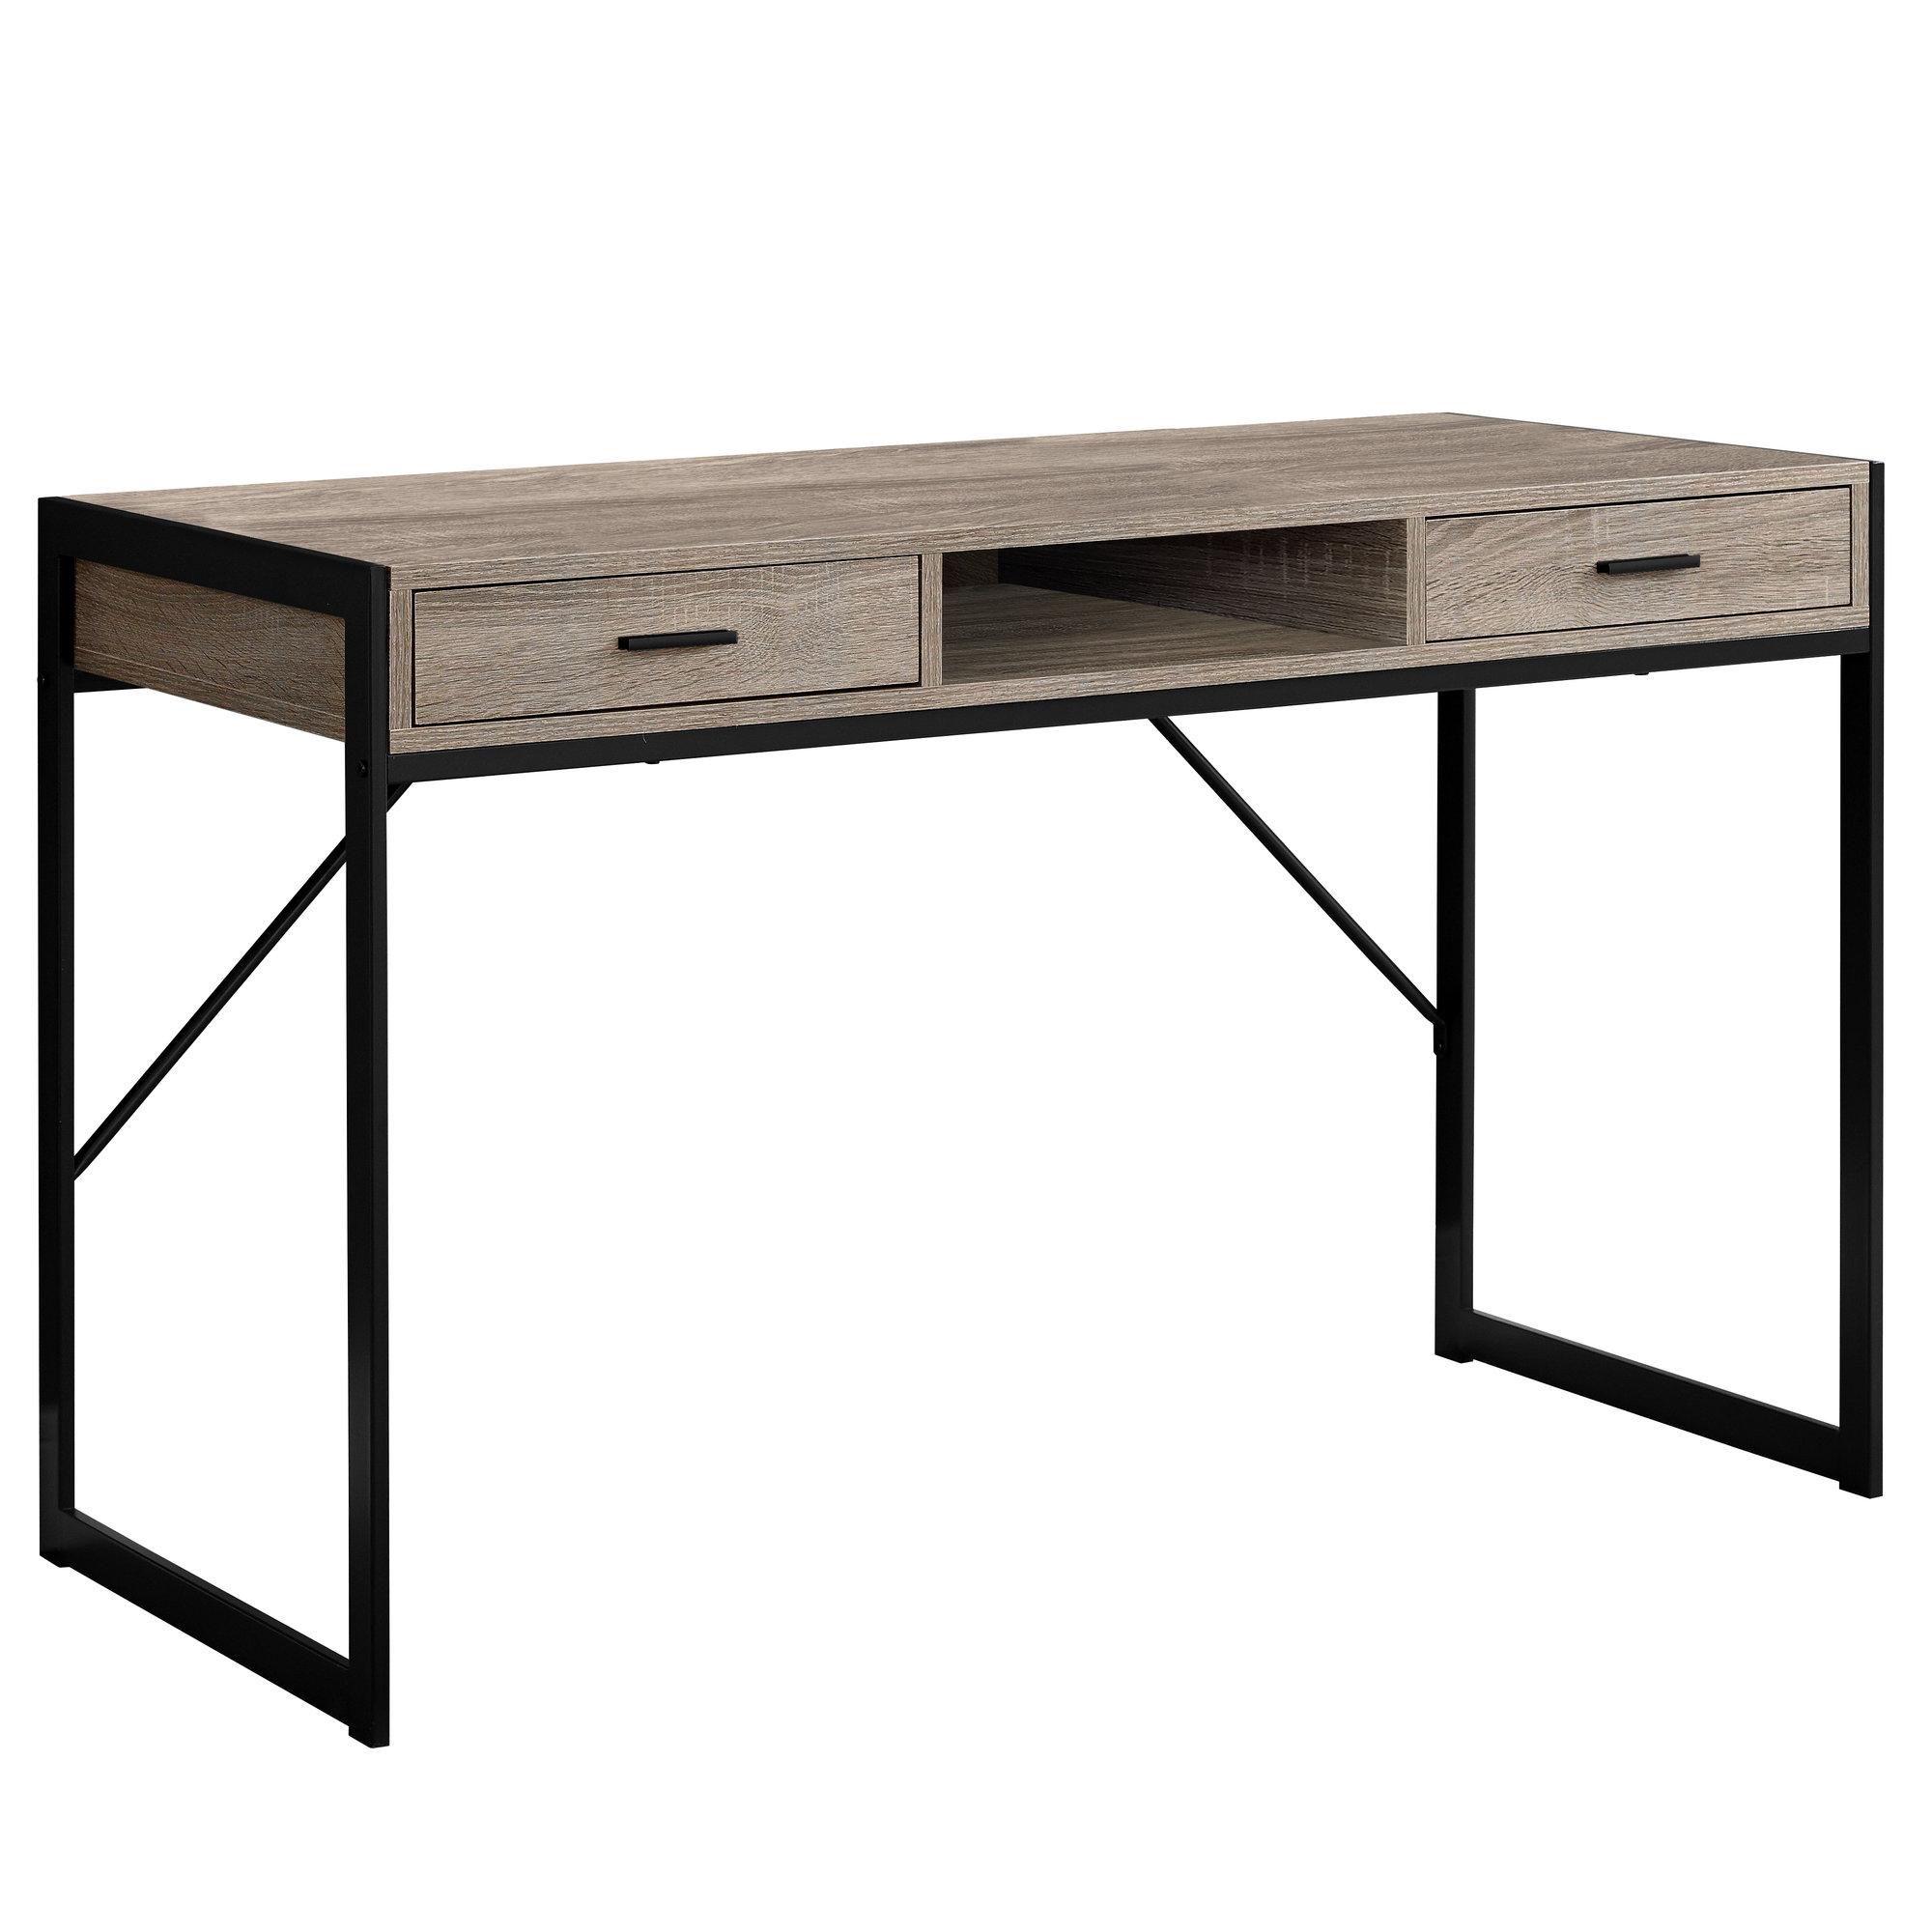 "22"" x 48"" x 30"" Dark Taupe  Black  Metal  Computer Desk"